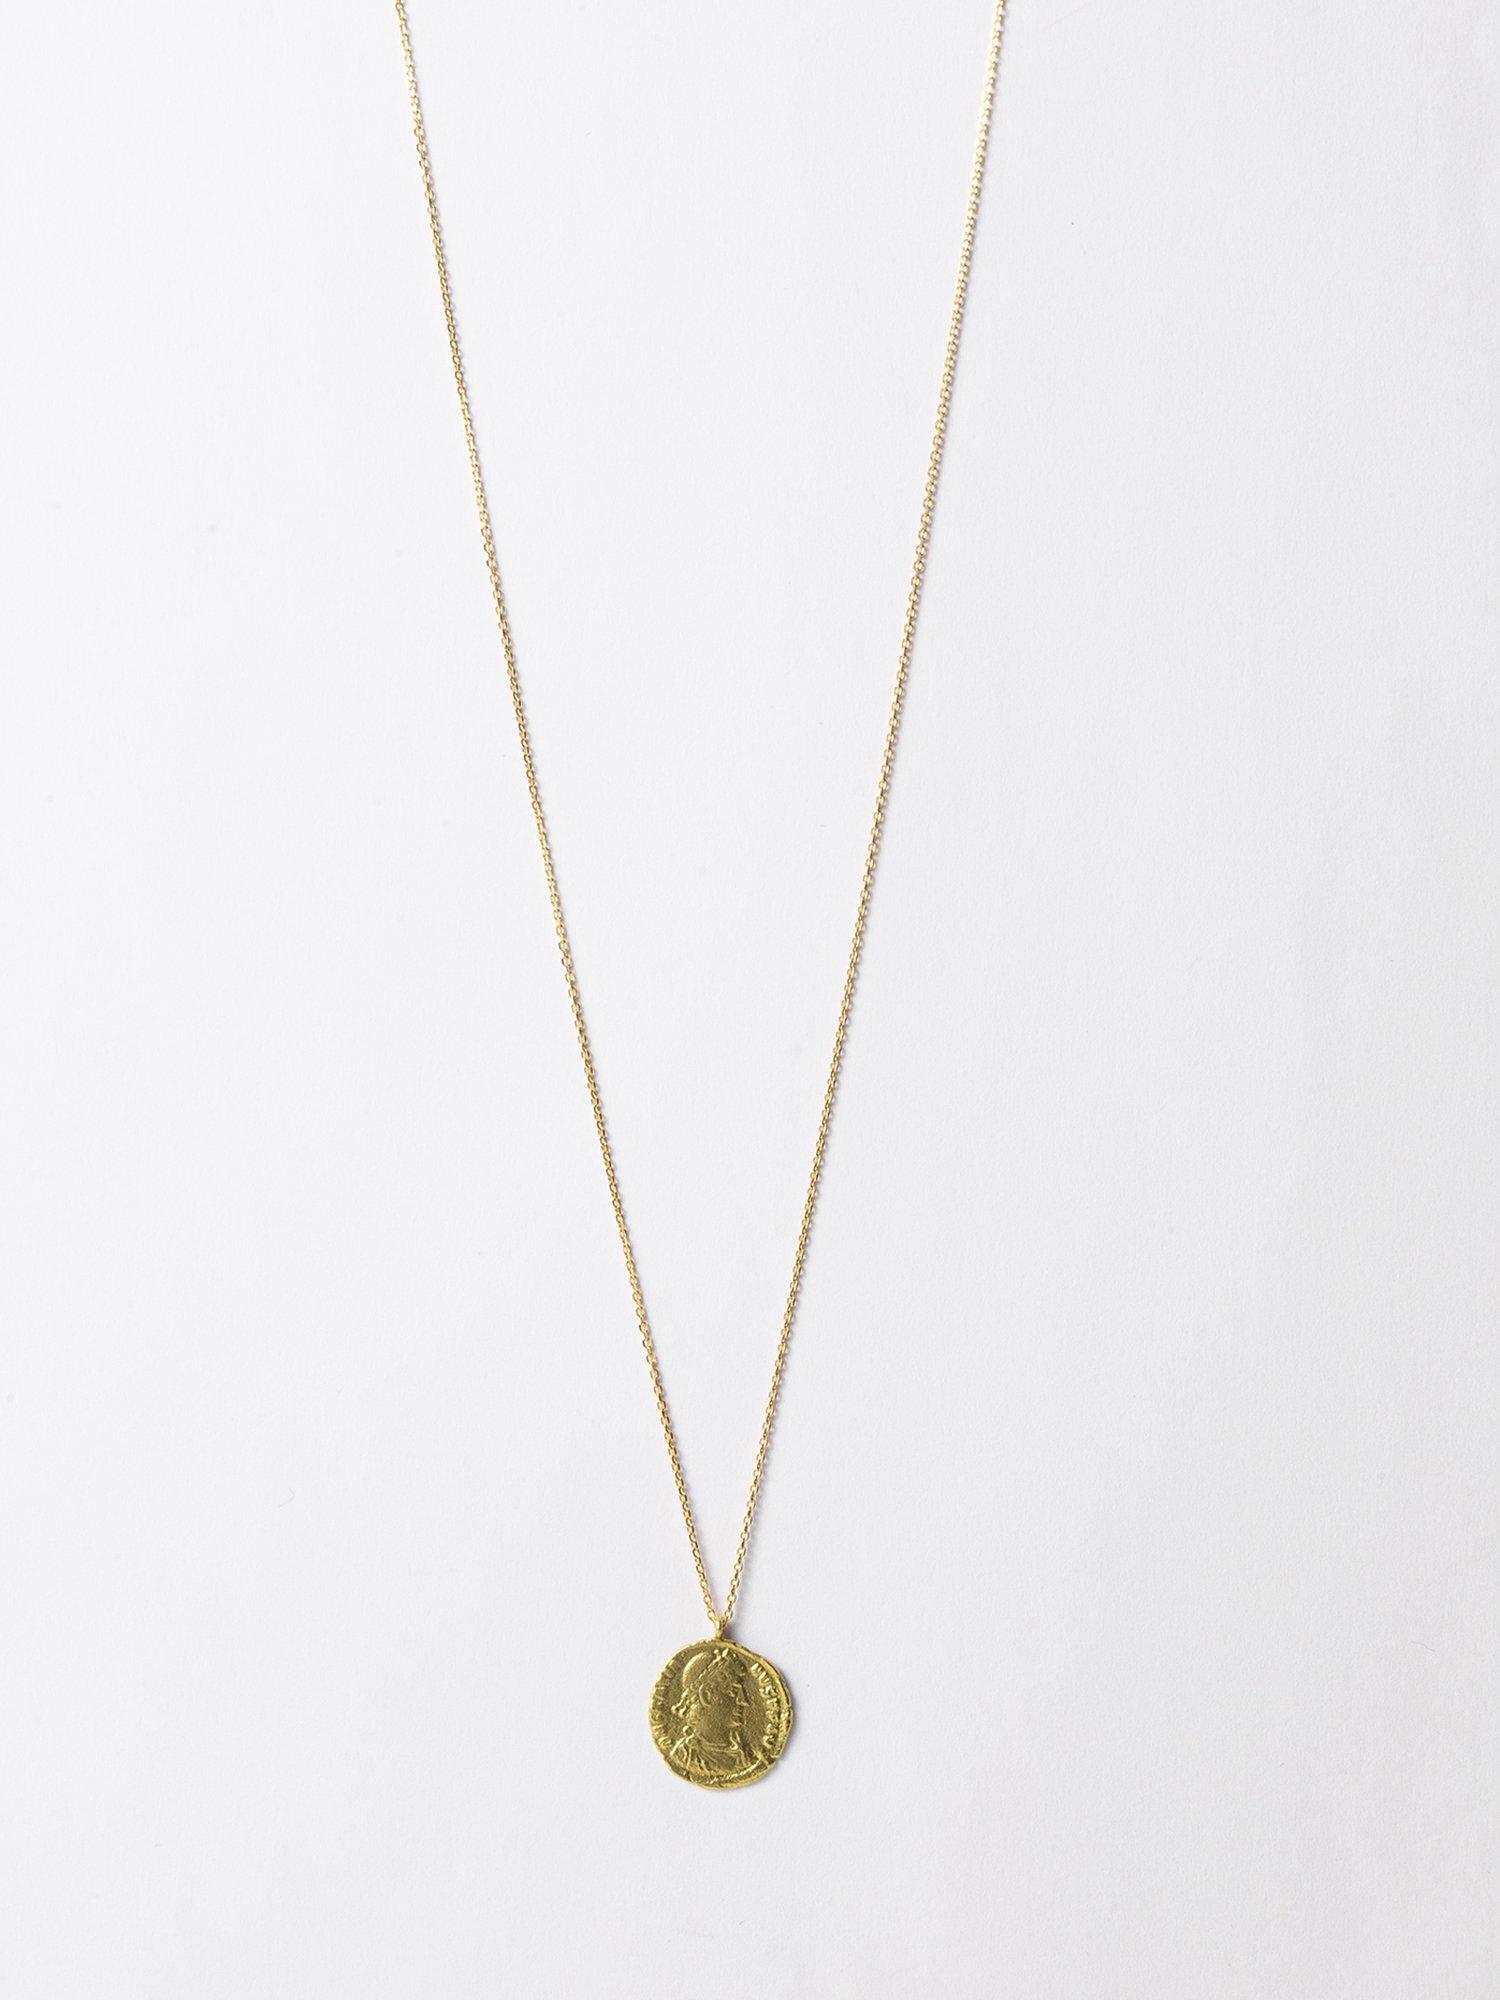 HELIOS / Roman coin necklace / Gratianus / 在庫商品